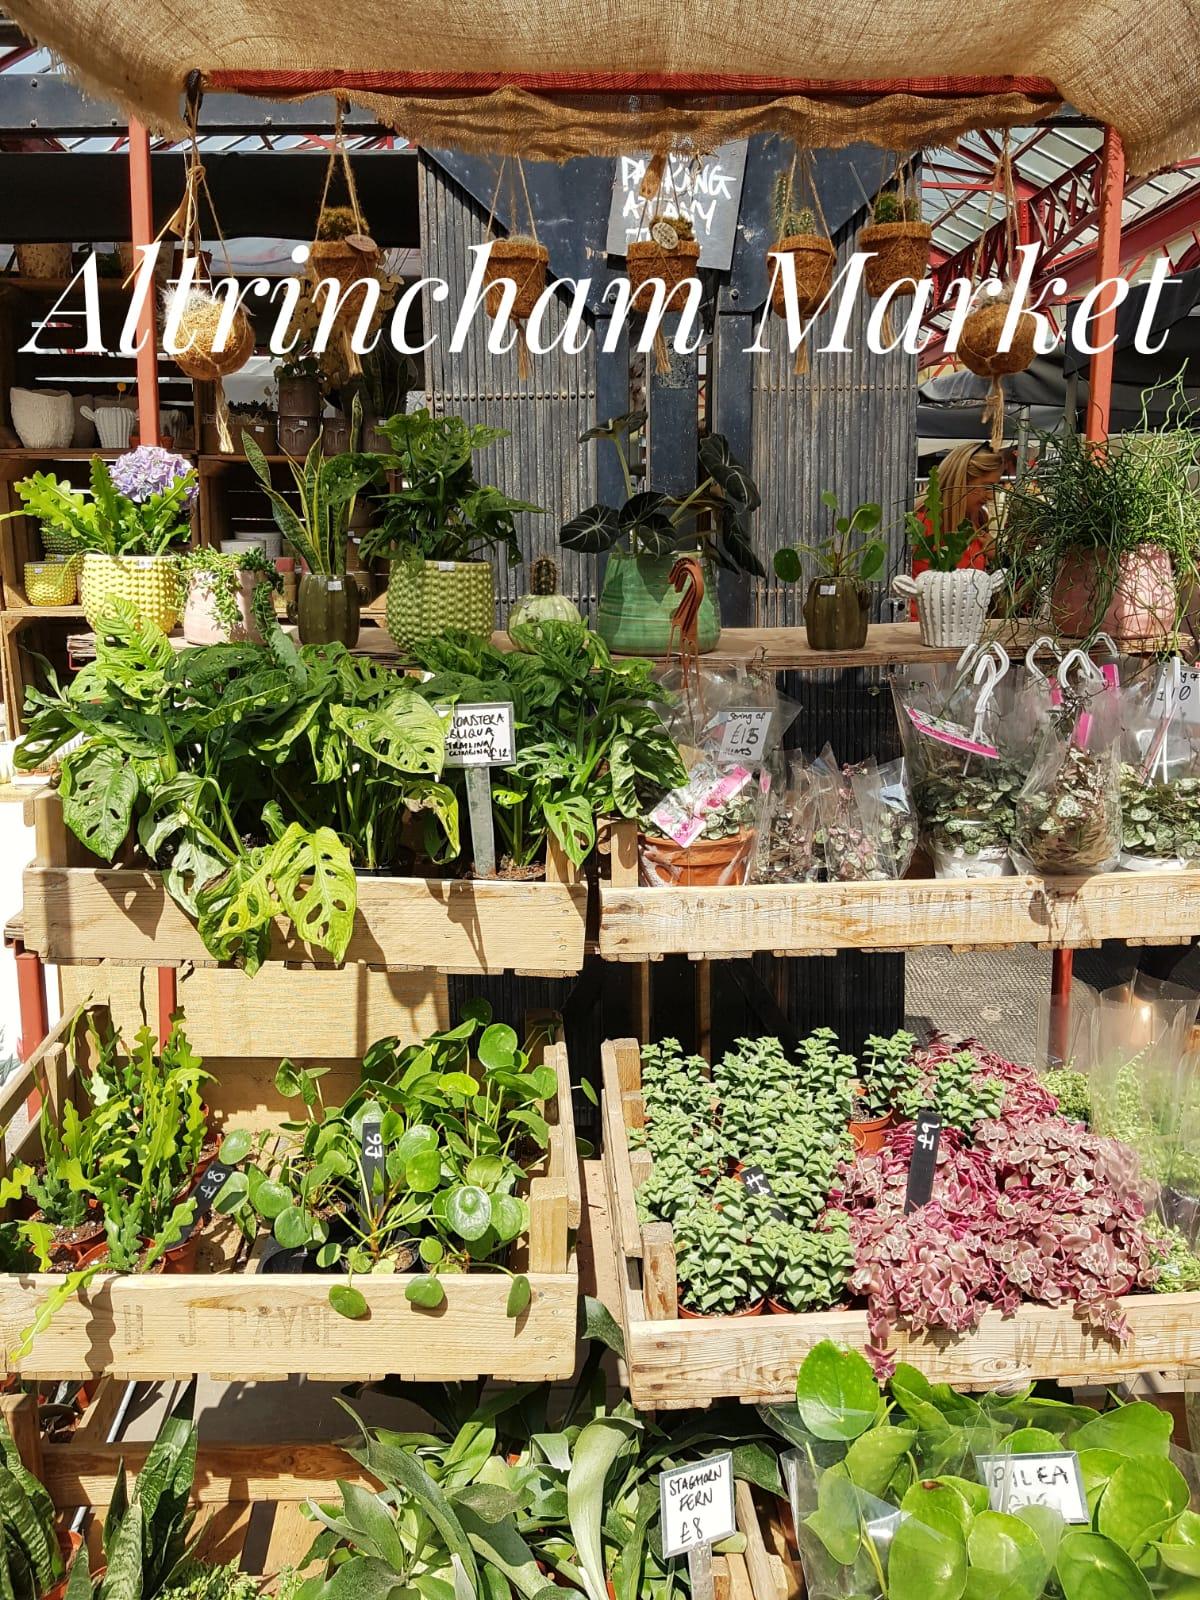 Altrincham Market